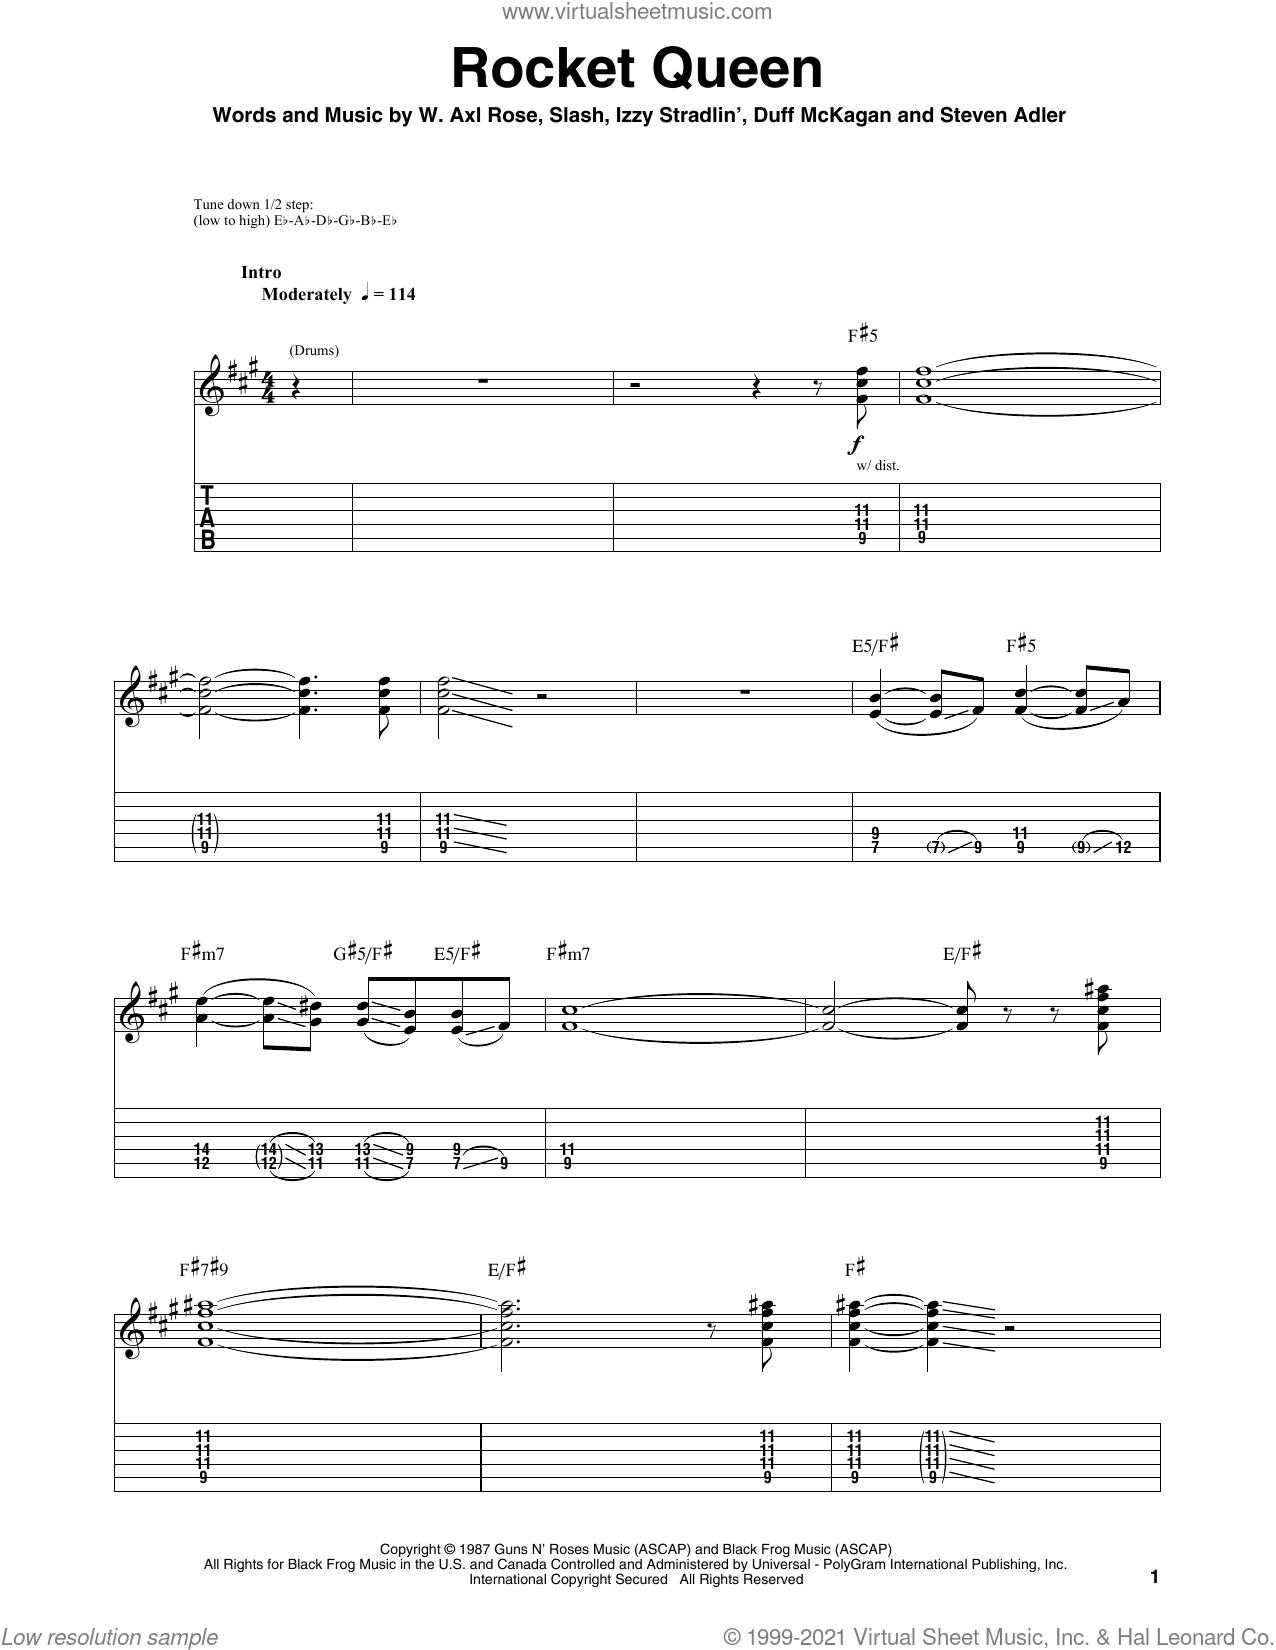 Rocket Queen sheet music for guitar (tablature, play-along) by Guns N' Roses, Axl Rose, Duff McKagan, Slash and Steven Adler, intermediate skill level